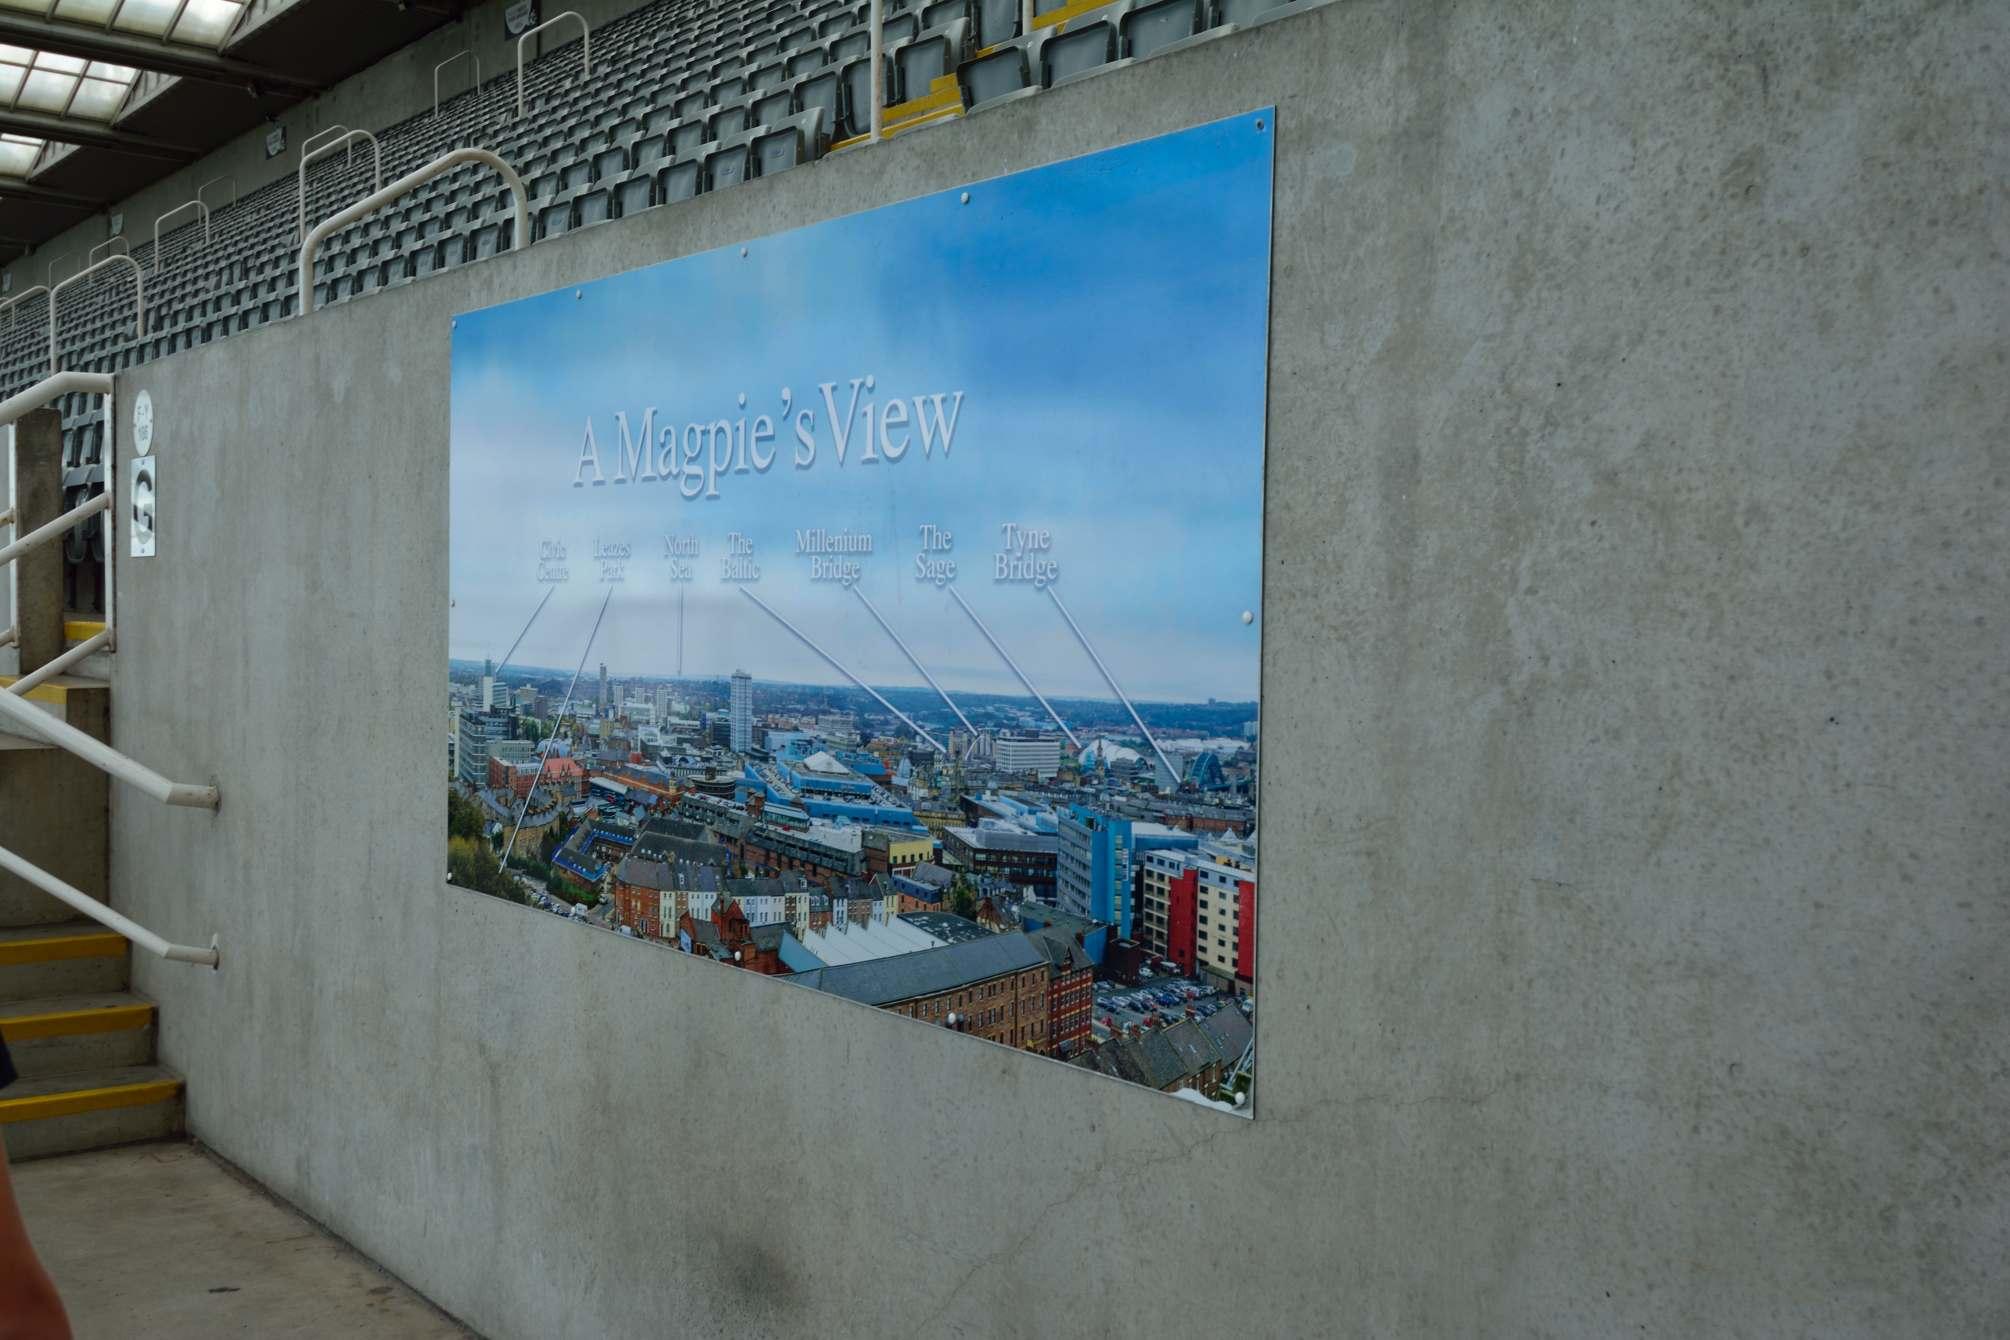 nufc tours6 Newcastle United Stadium Tours for Fans